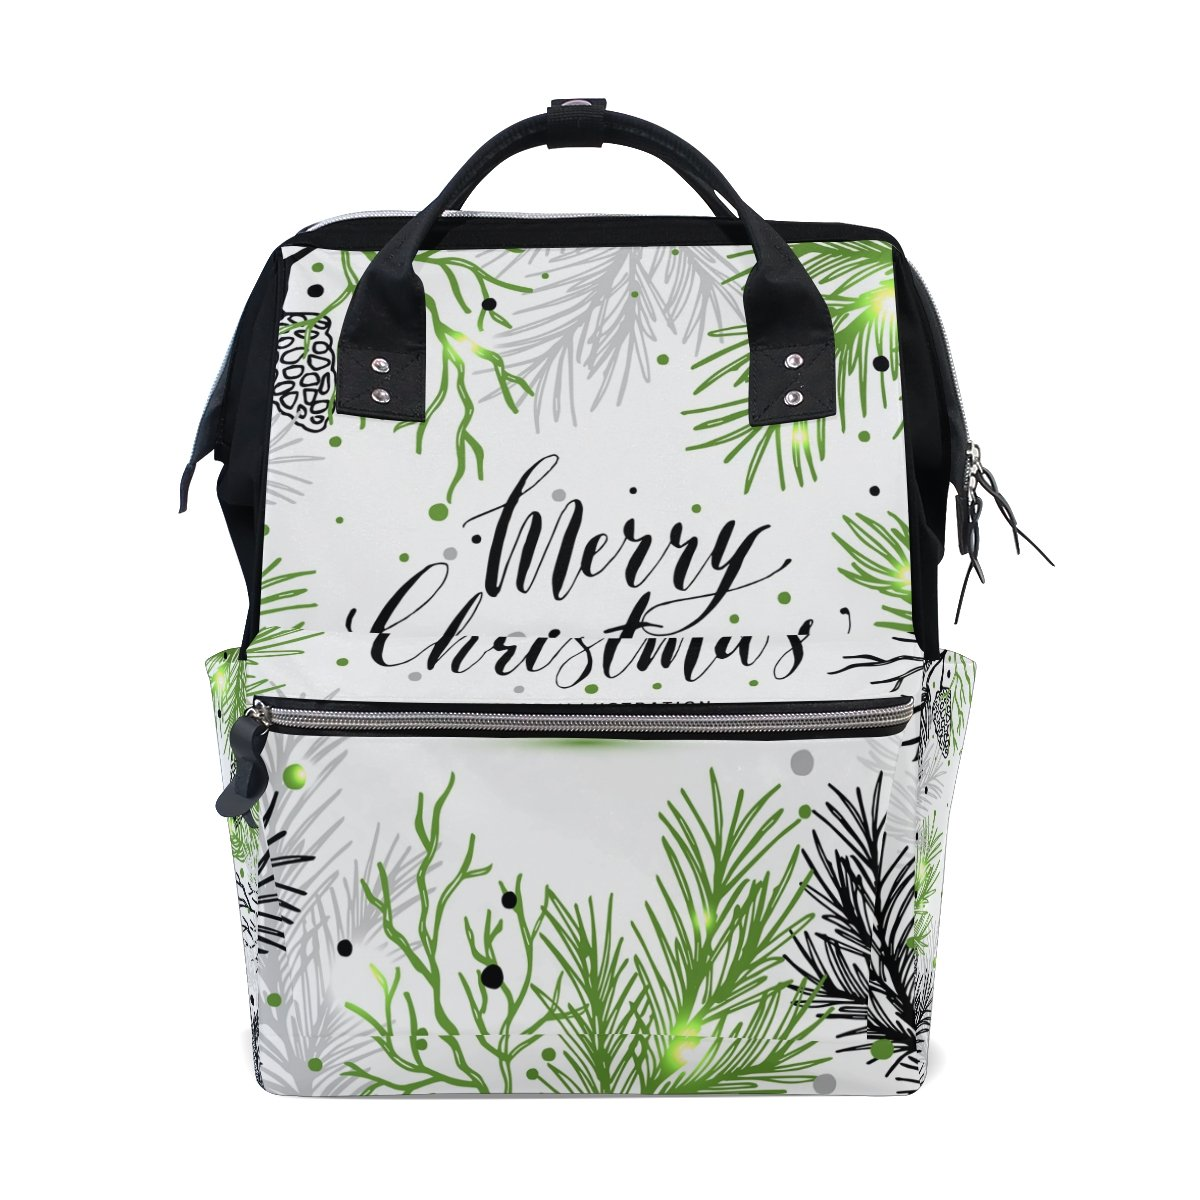 JSTEL ノートパソコン用カレッジバッグ 学生 旅行 メリークリスマス 新年 ツリー スクールバックパック ショルダートートバッグ   B078MXGL53